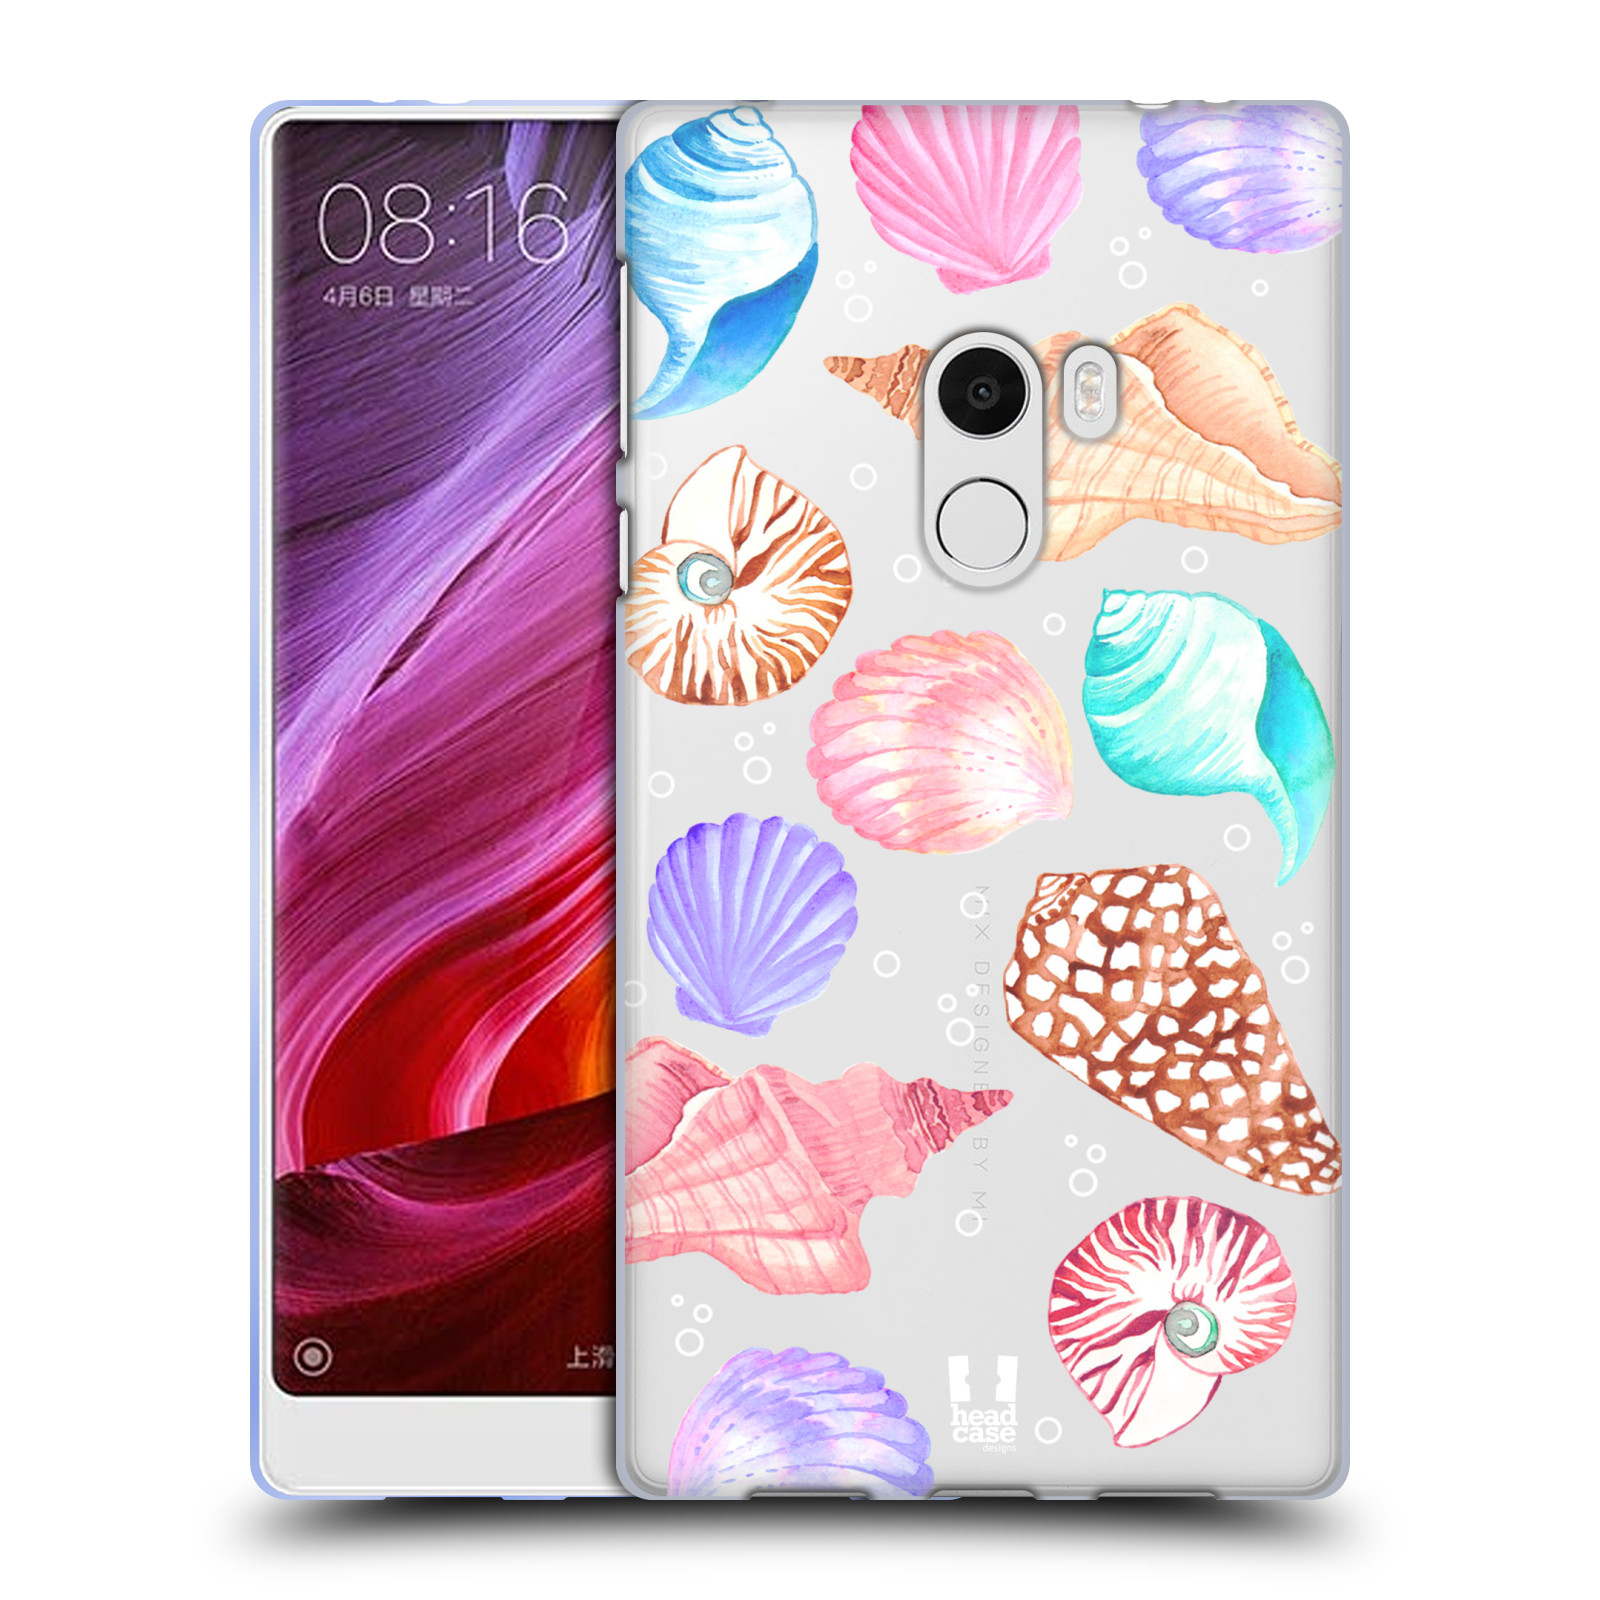 HEAD-CASE-DESIGNS-WATERCOLOURED-SEA-LIFE-SOFT-GEL-CASE-FOR-XIAOMI-PHONES